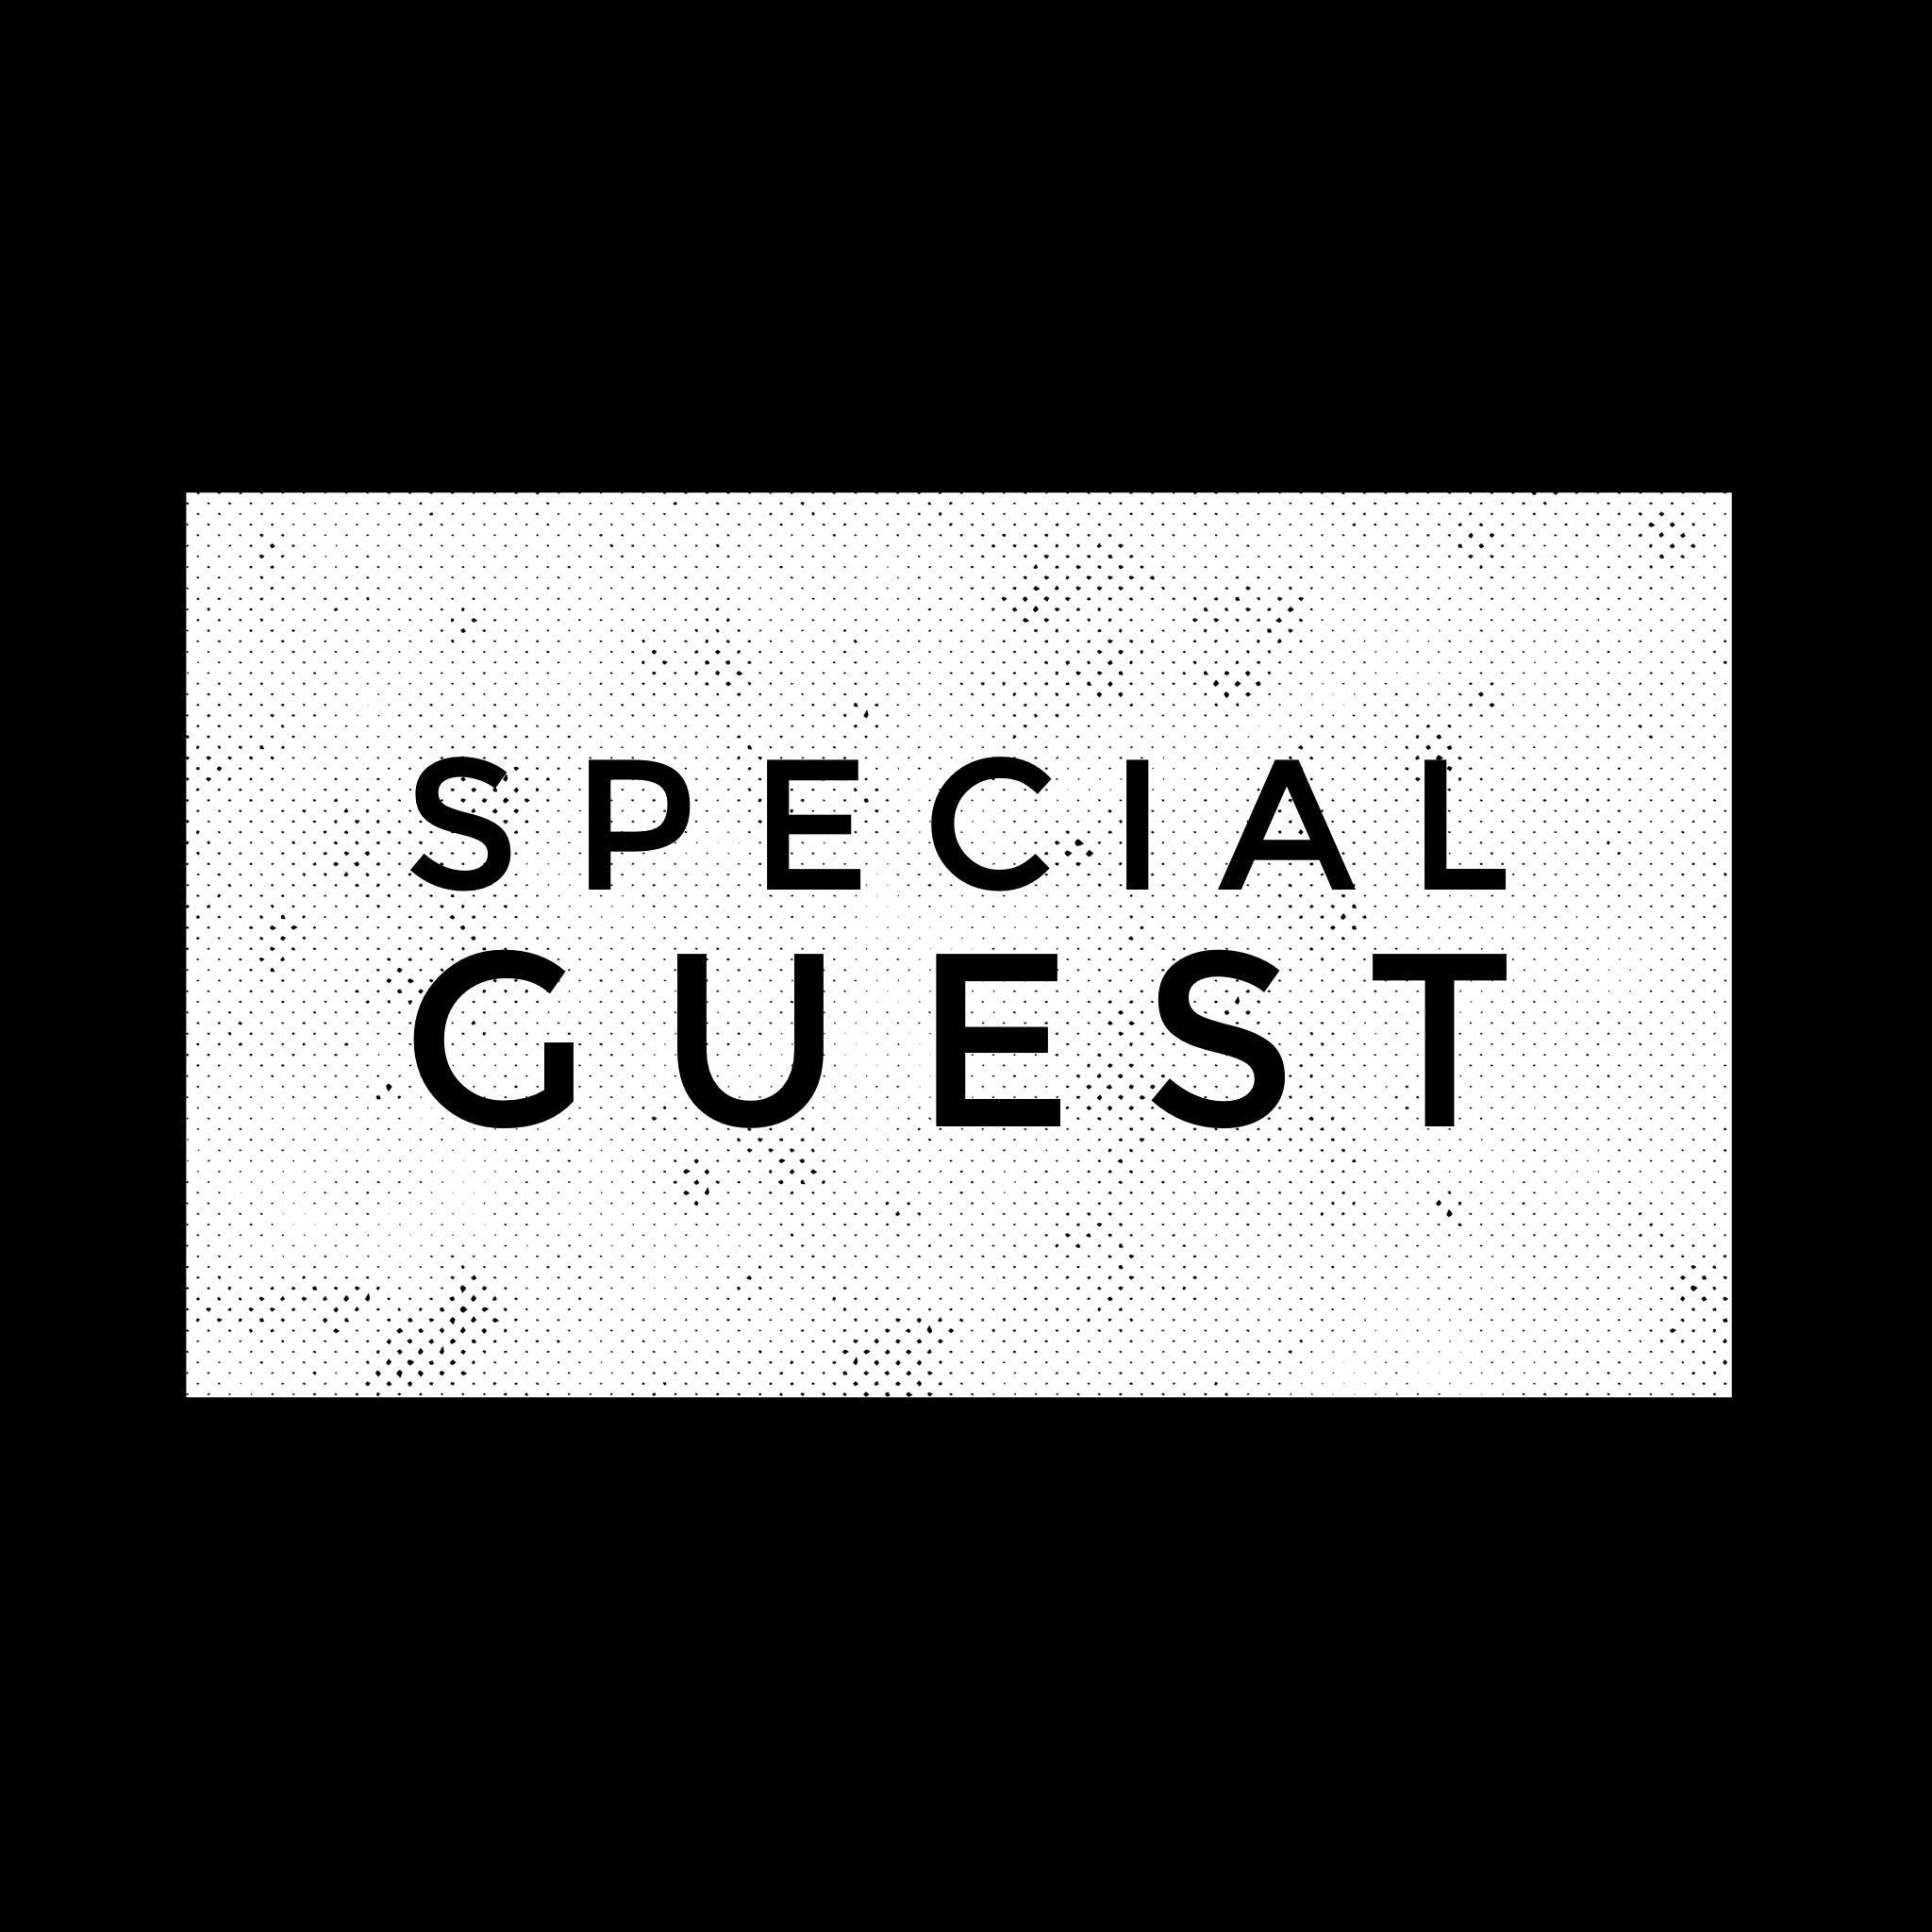 Special Guest slide.jpg